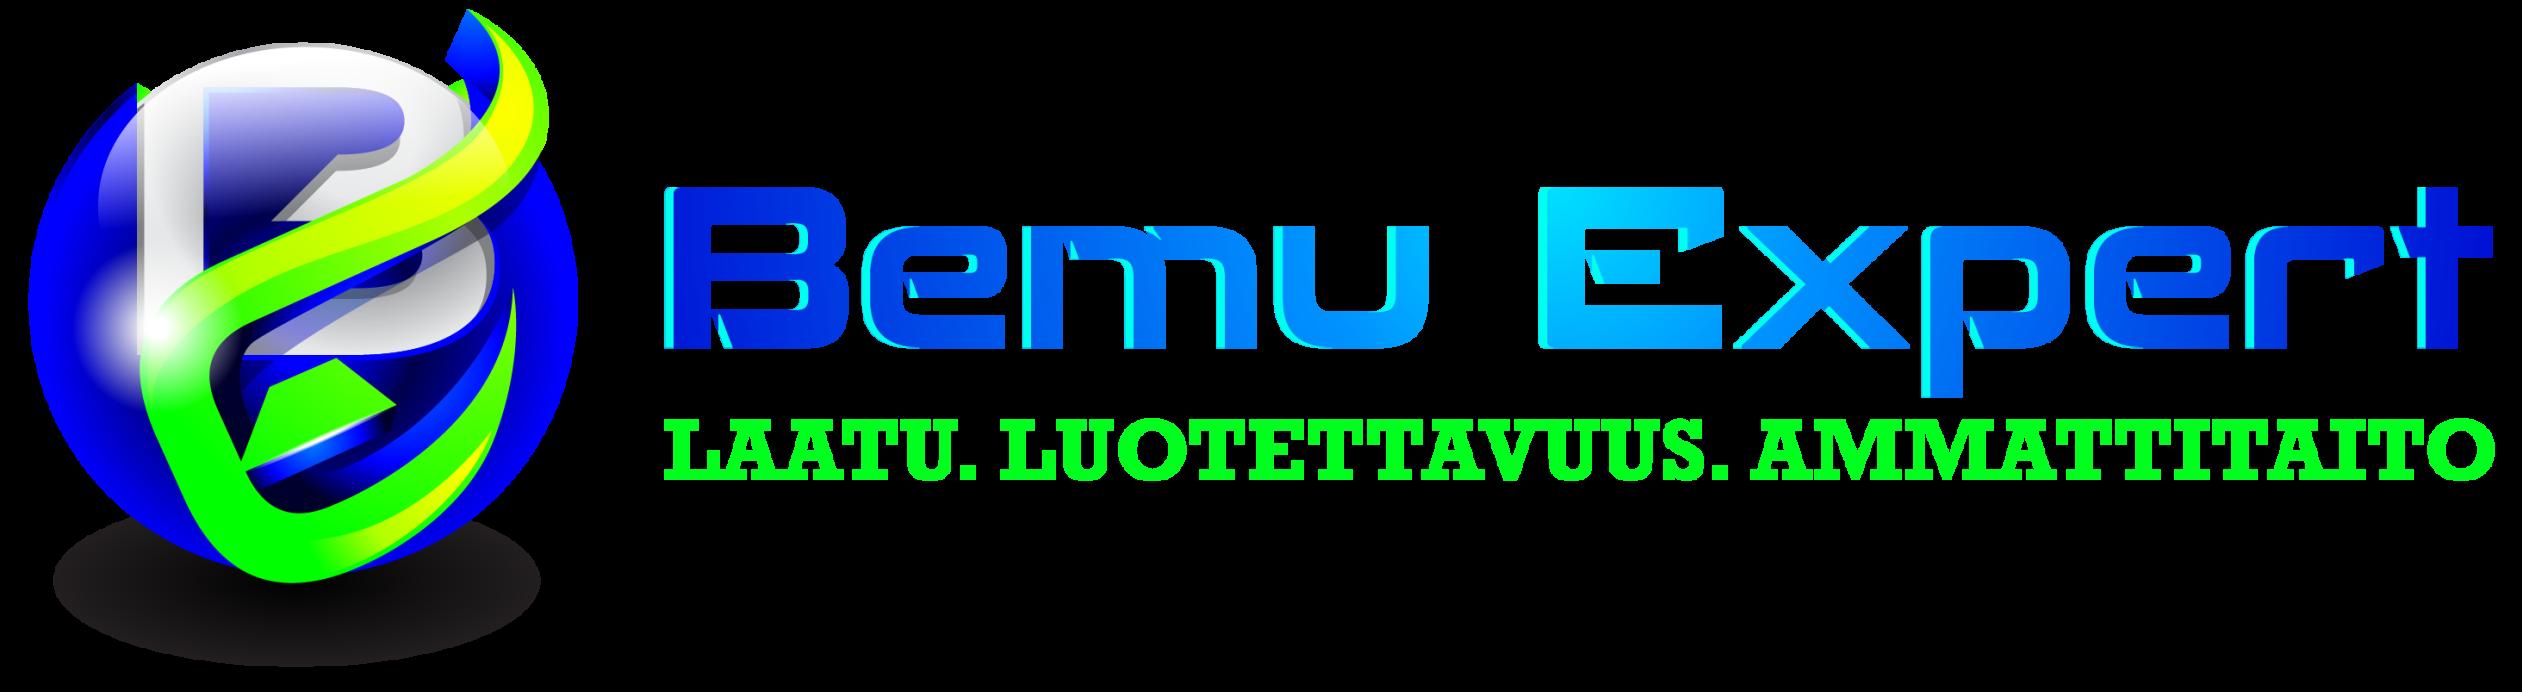 Bemu Expert Oy: BMW, huolto, Janakkala, Kanta-Hame